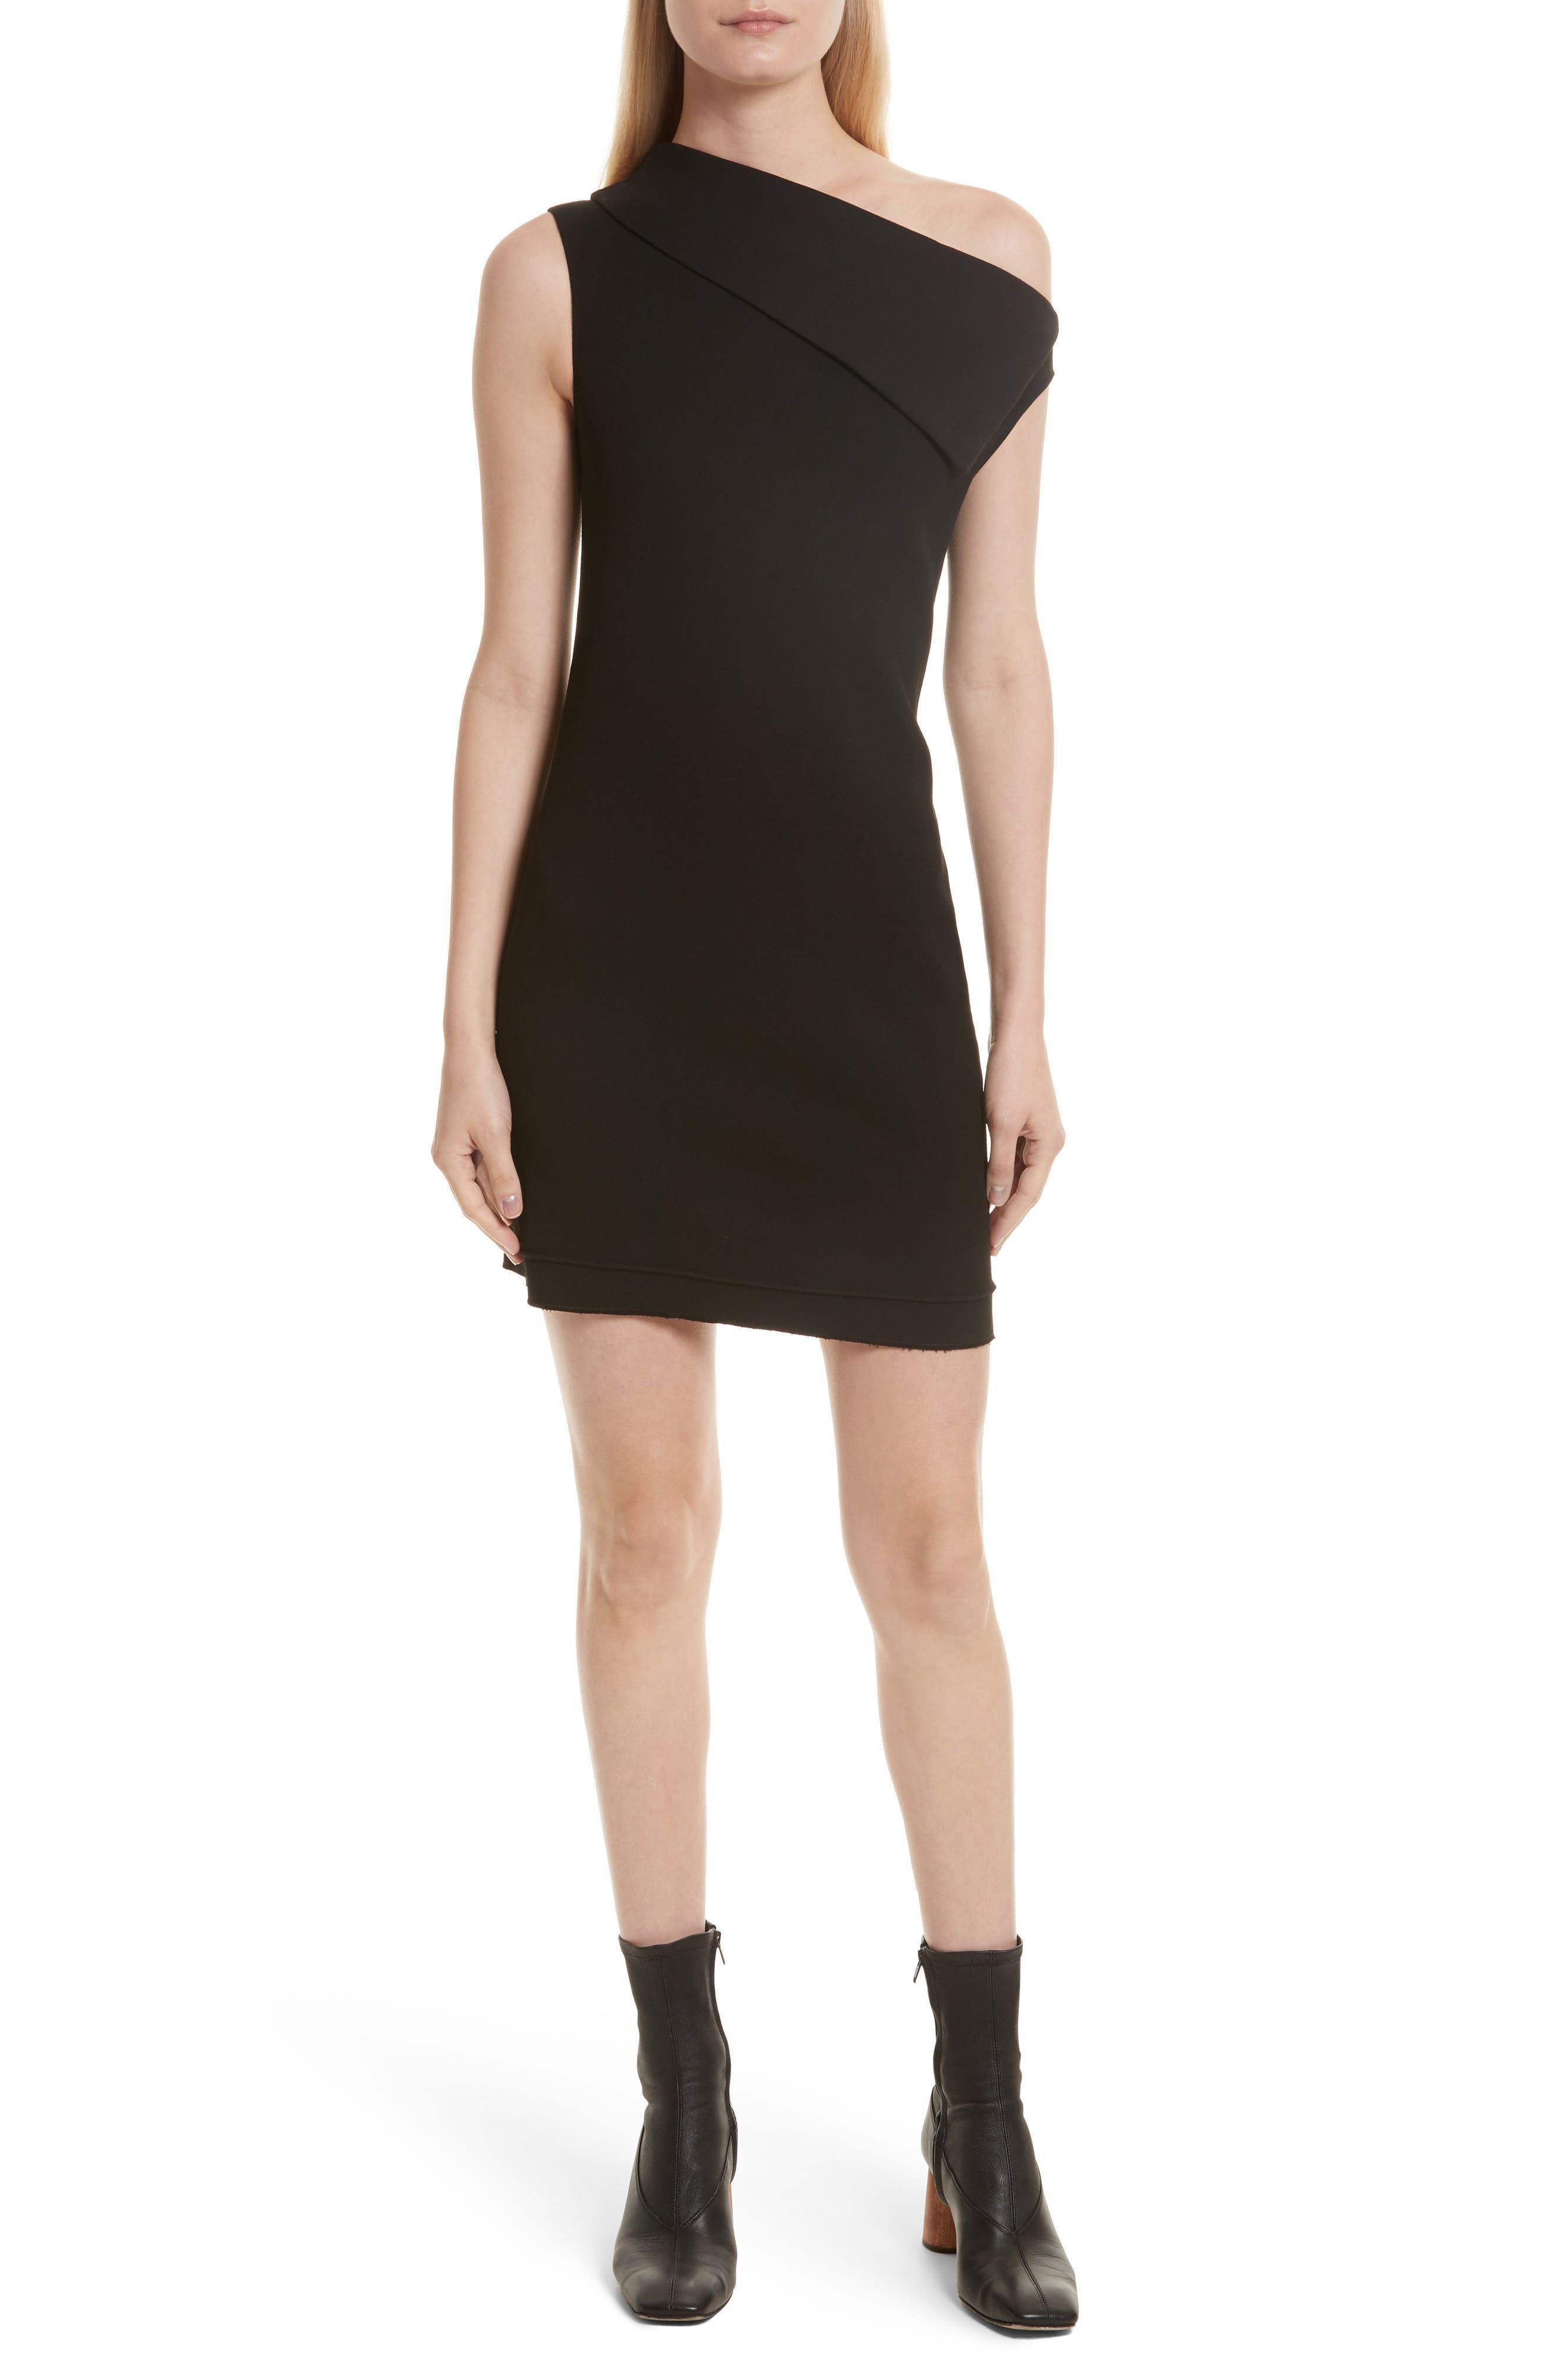 Women's Black Cocktail & Party Dresses | Nordstrom